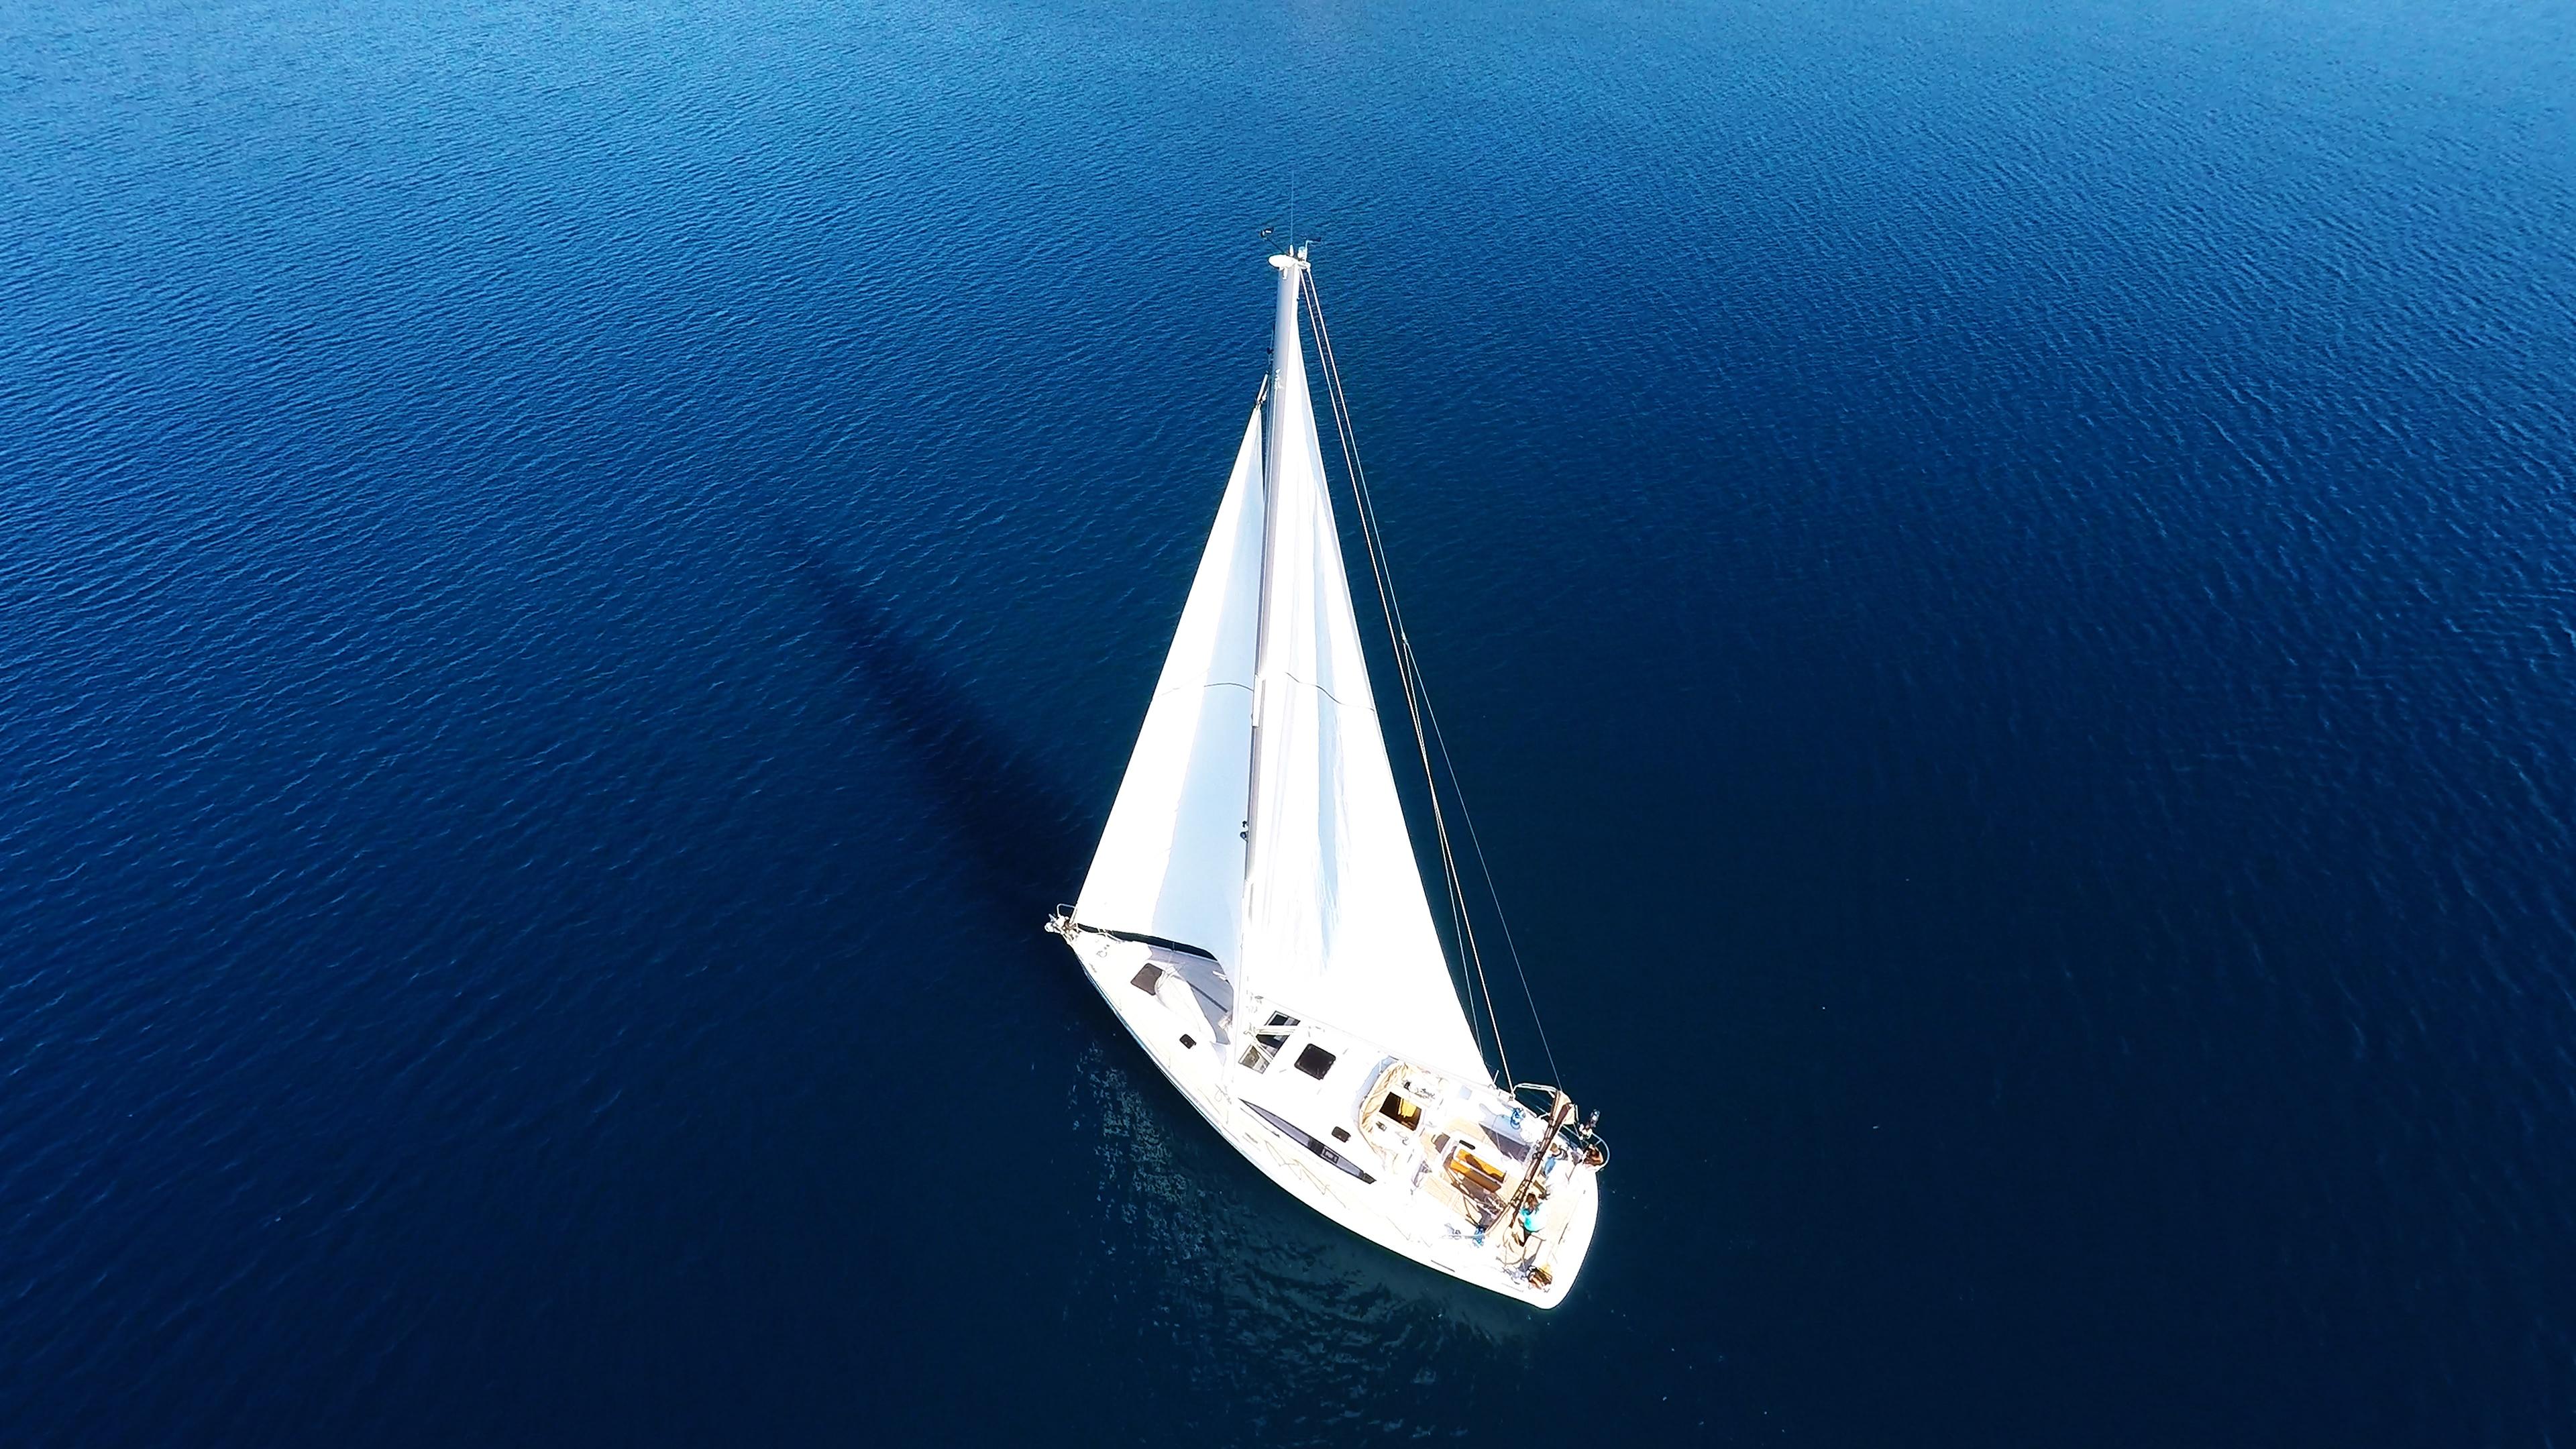 barcha a vela barca a vela da sopra mare blu